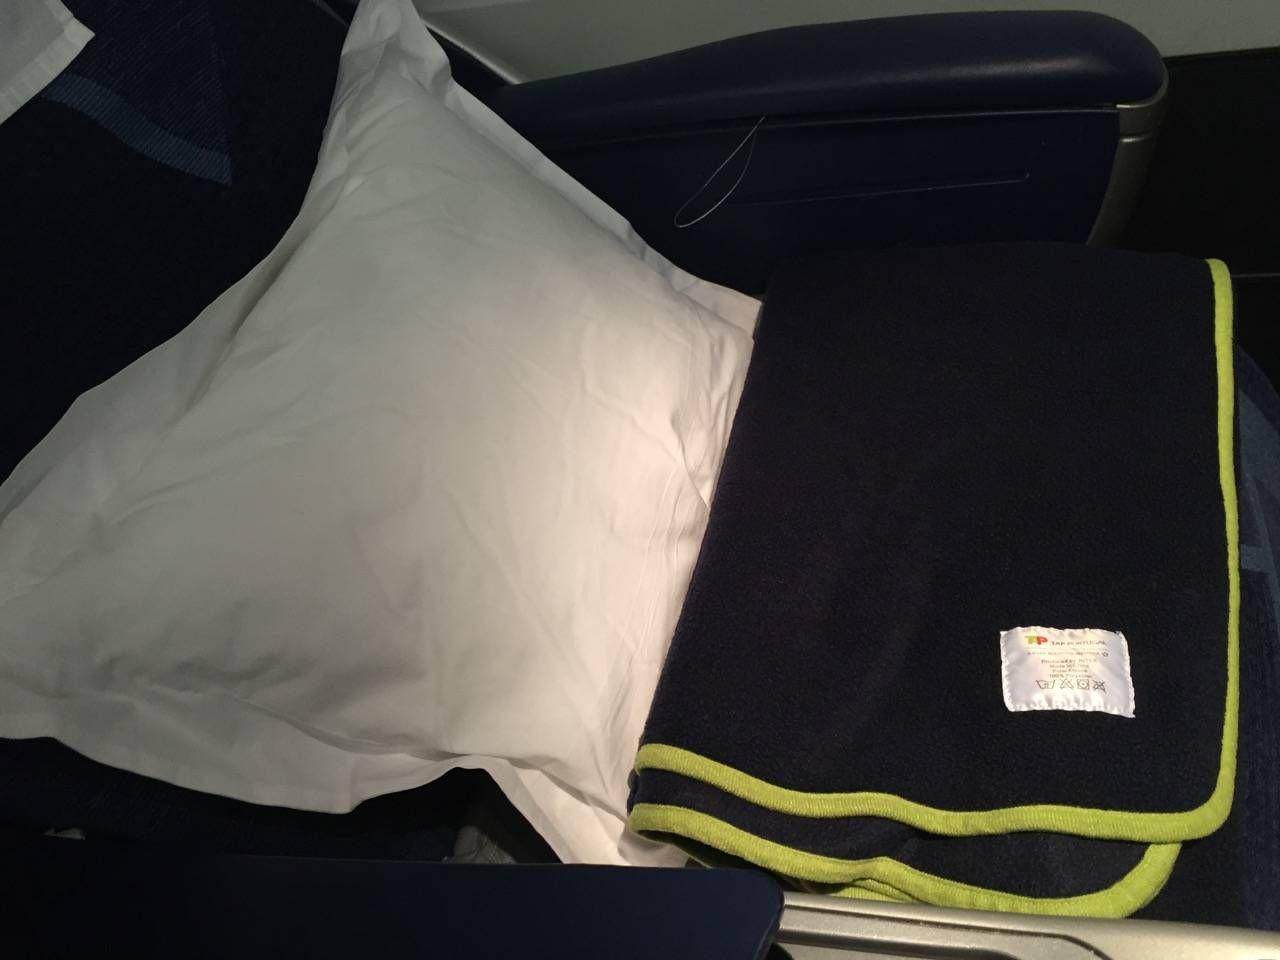 Classe Executiva TAP A330 Passageiro de Primeira-039